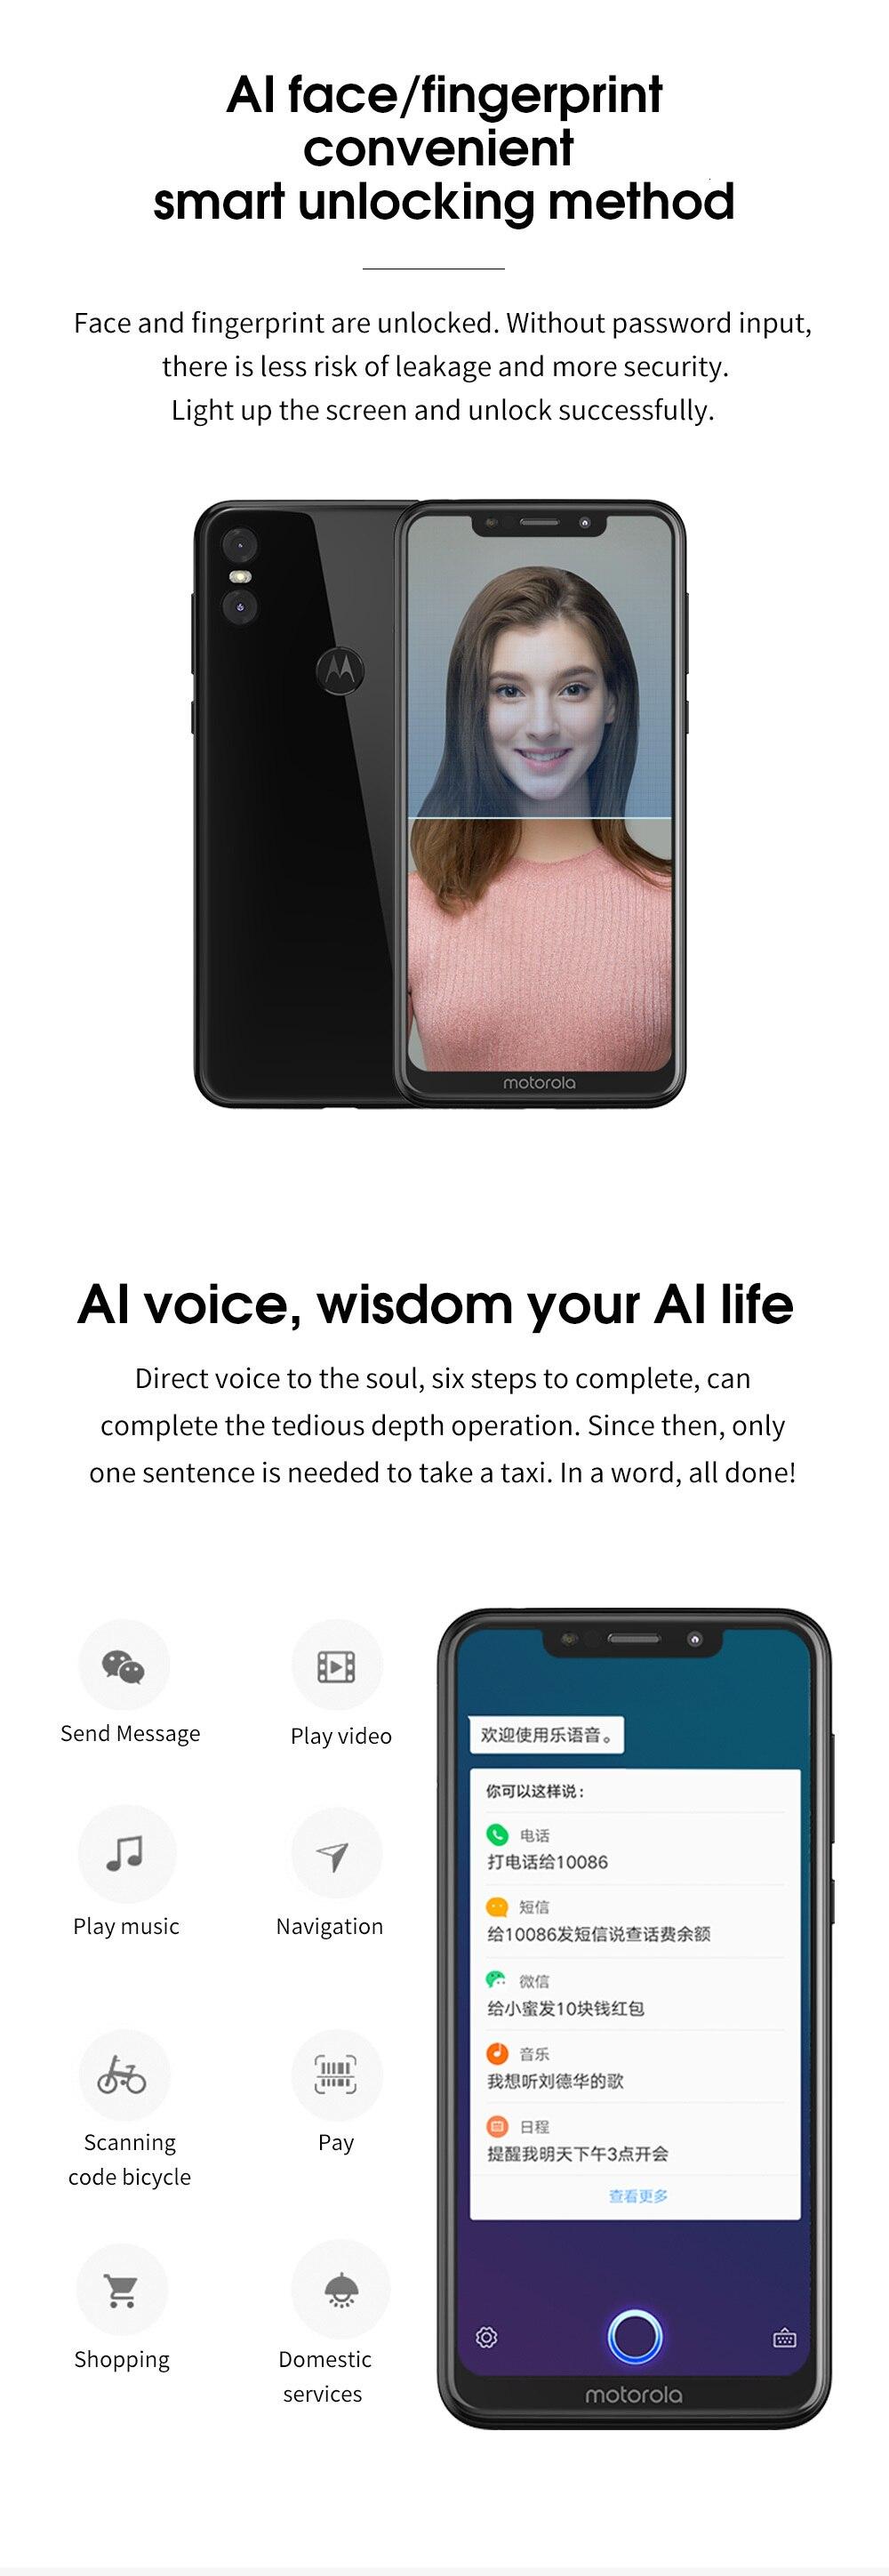 H80a69bf62b6f417a8c157169fb4d4057N Moto One Mobile Phone 4GB 64GB AI Camera Smartphone 2.5D Double-sided Glass Body Octa Core Phone Support Face Fingerprint Unlock